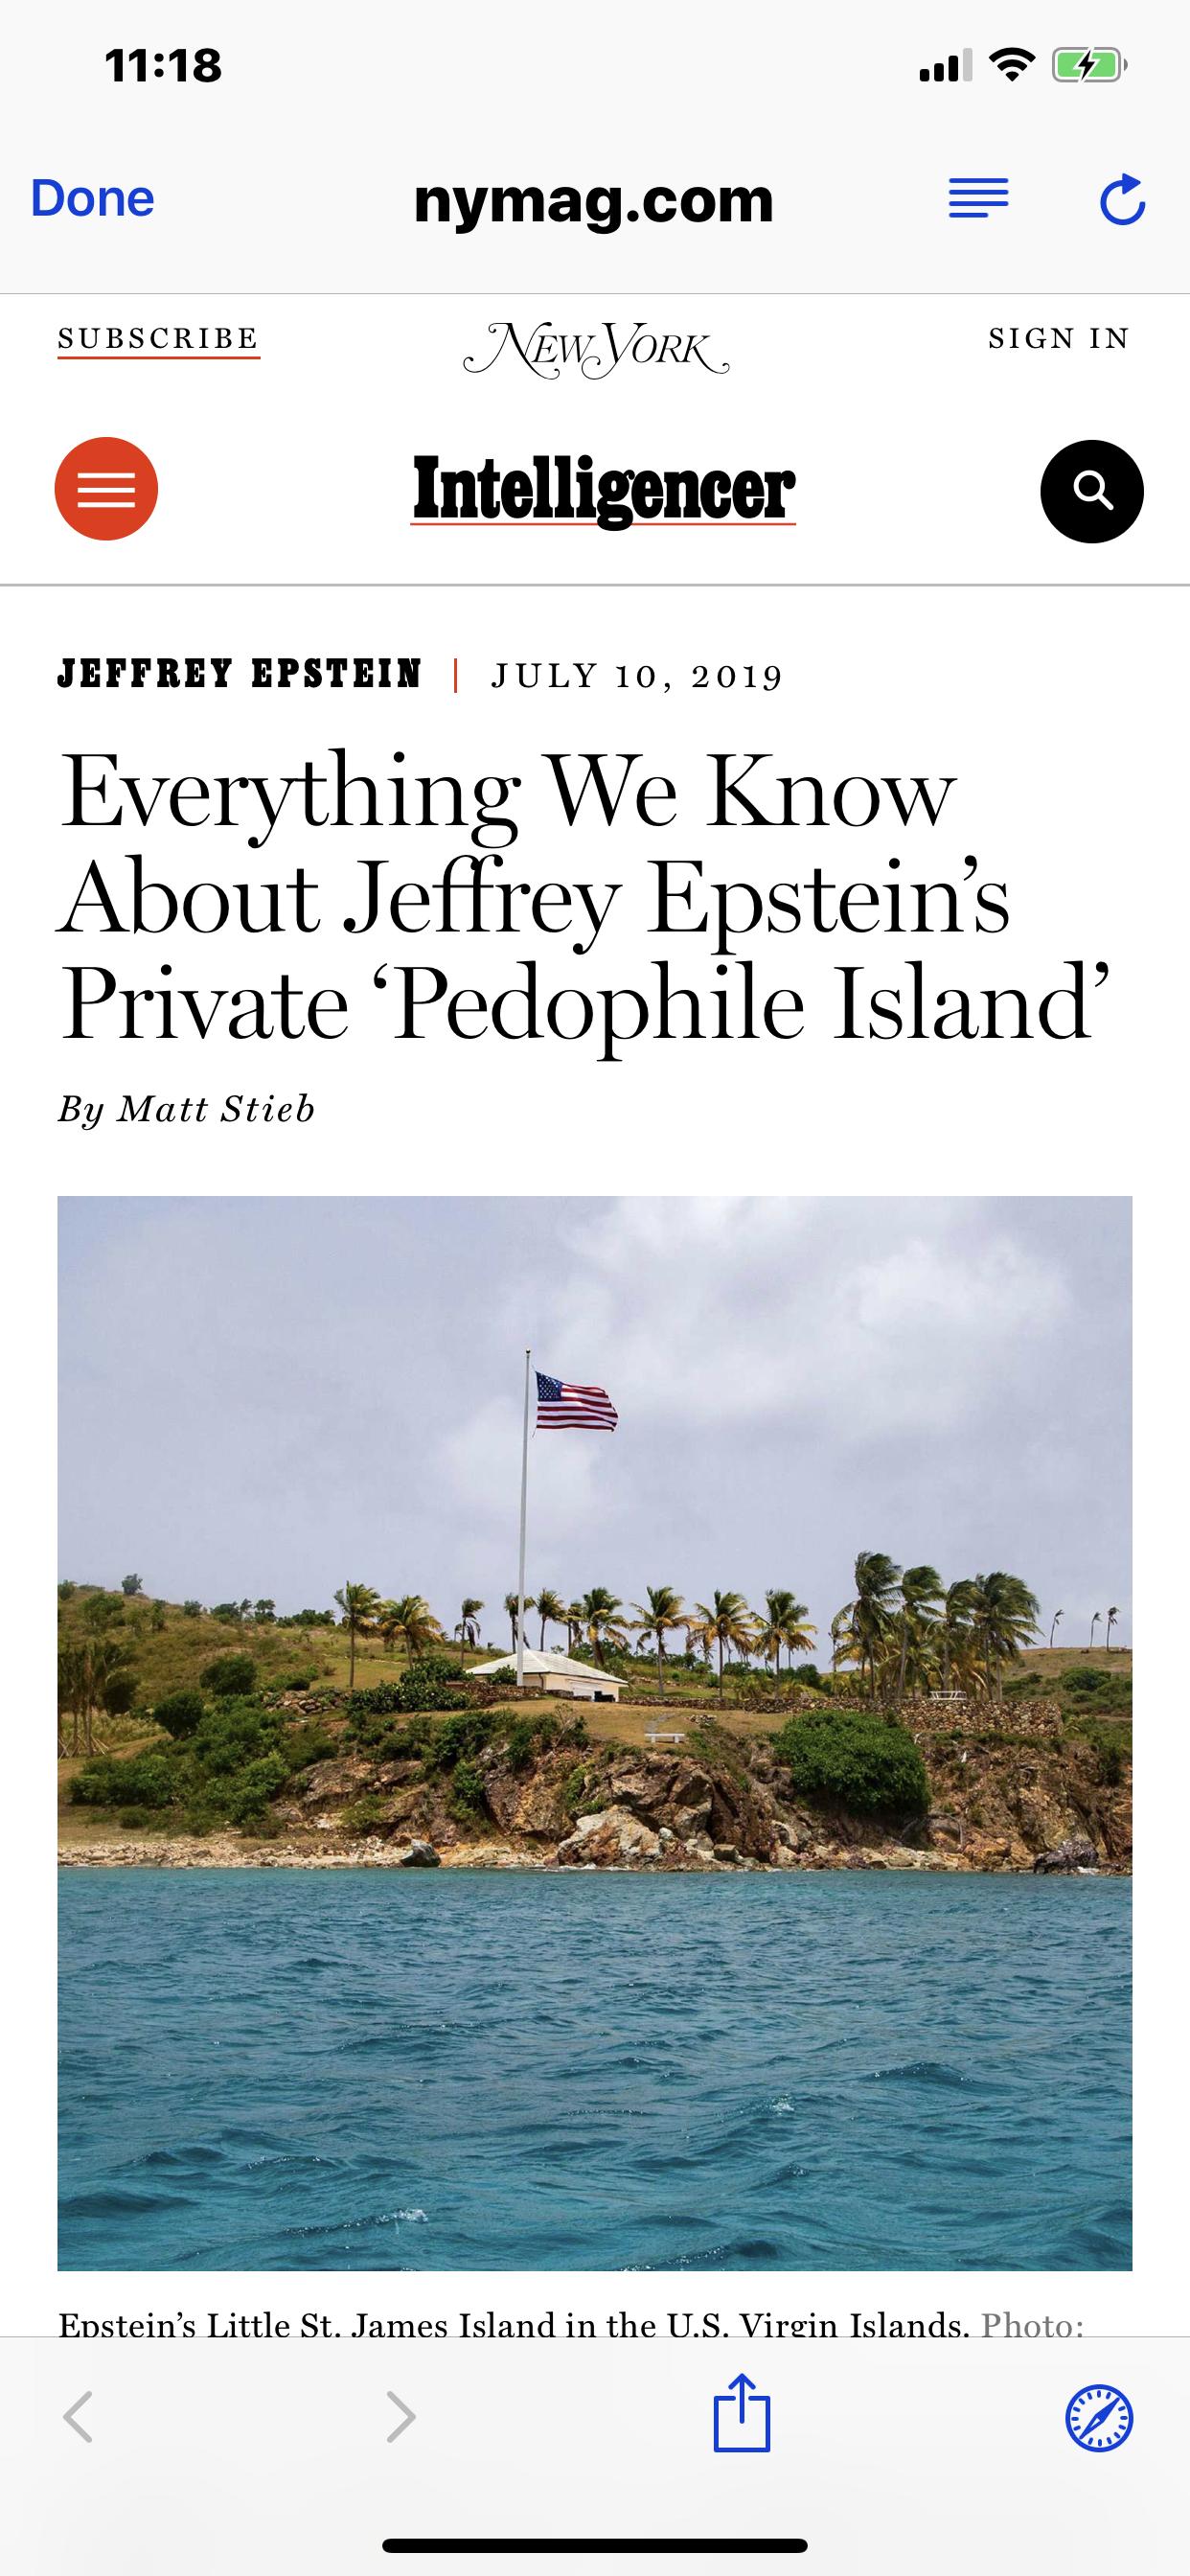 Everything We Know on Jeffrey Epstein's 'Pedophile Island'